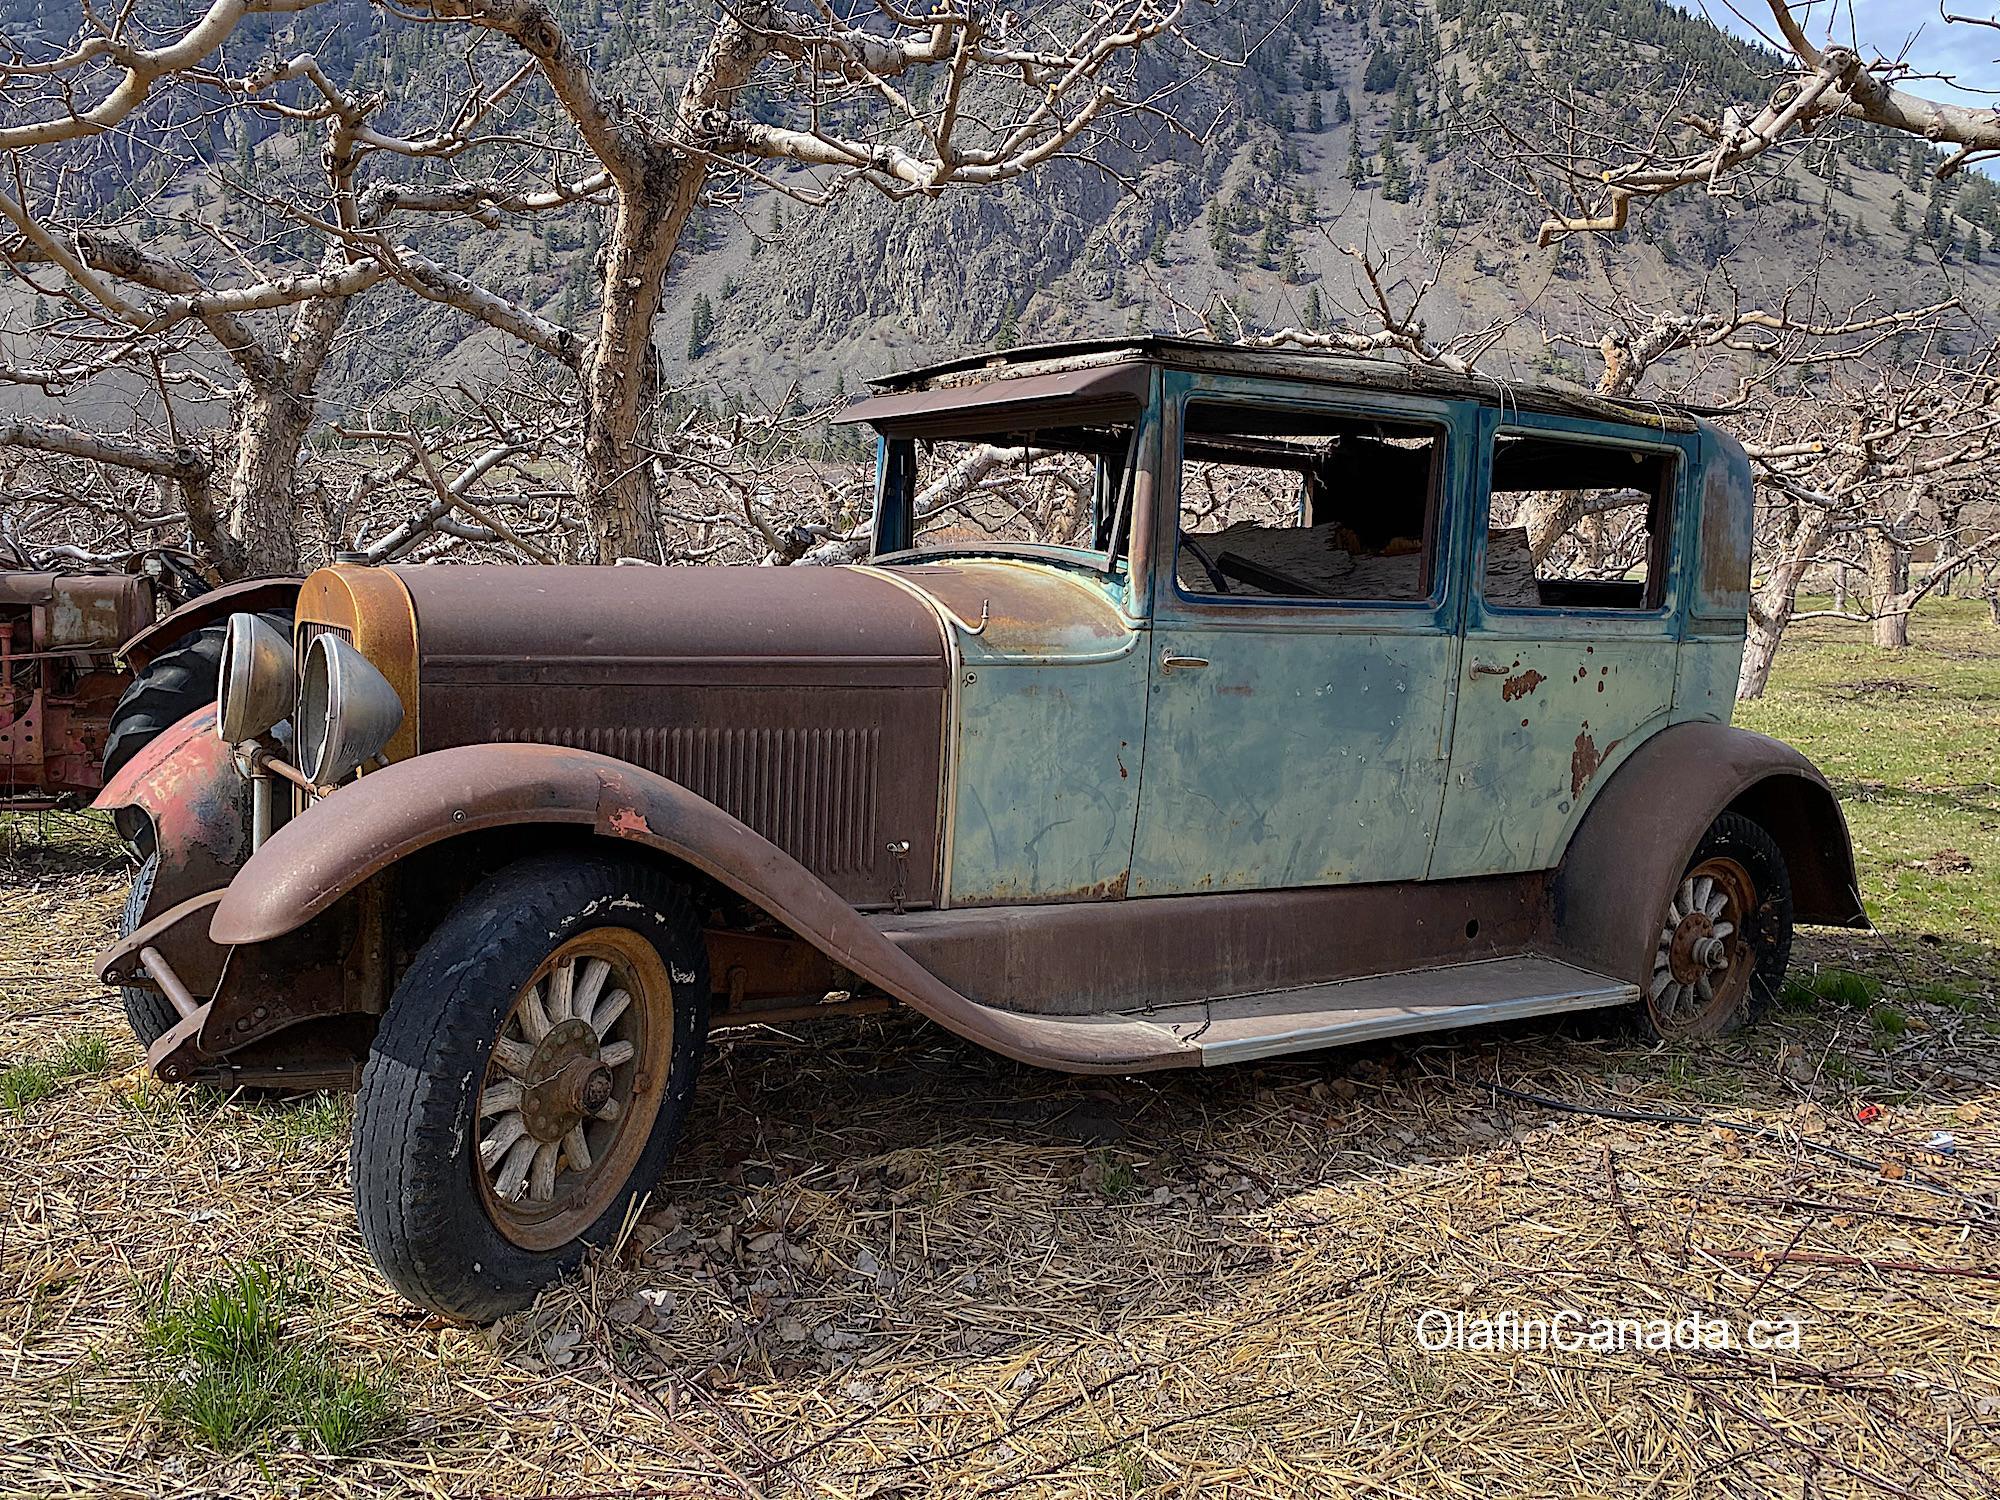 Old car from the thirties in Keremeos #olafincanada #britishcolumbia #discoverbc #abandonedbc #keremeos #car